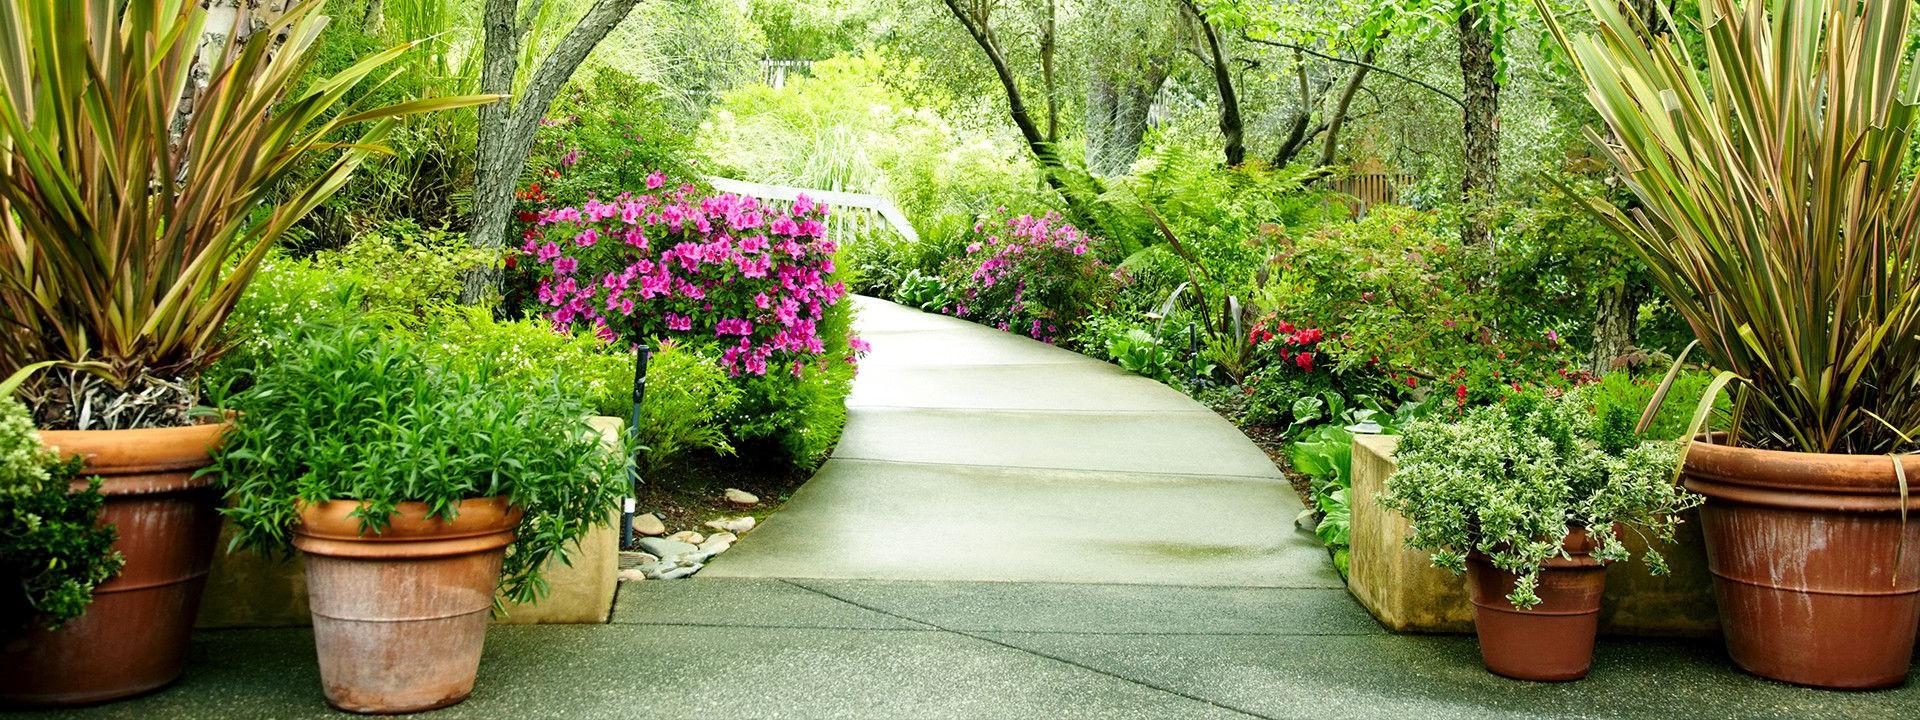 Resources | Rader Funeral Homes (Longview – Henderson)